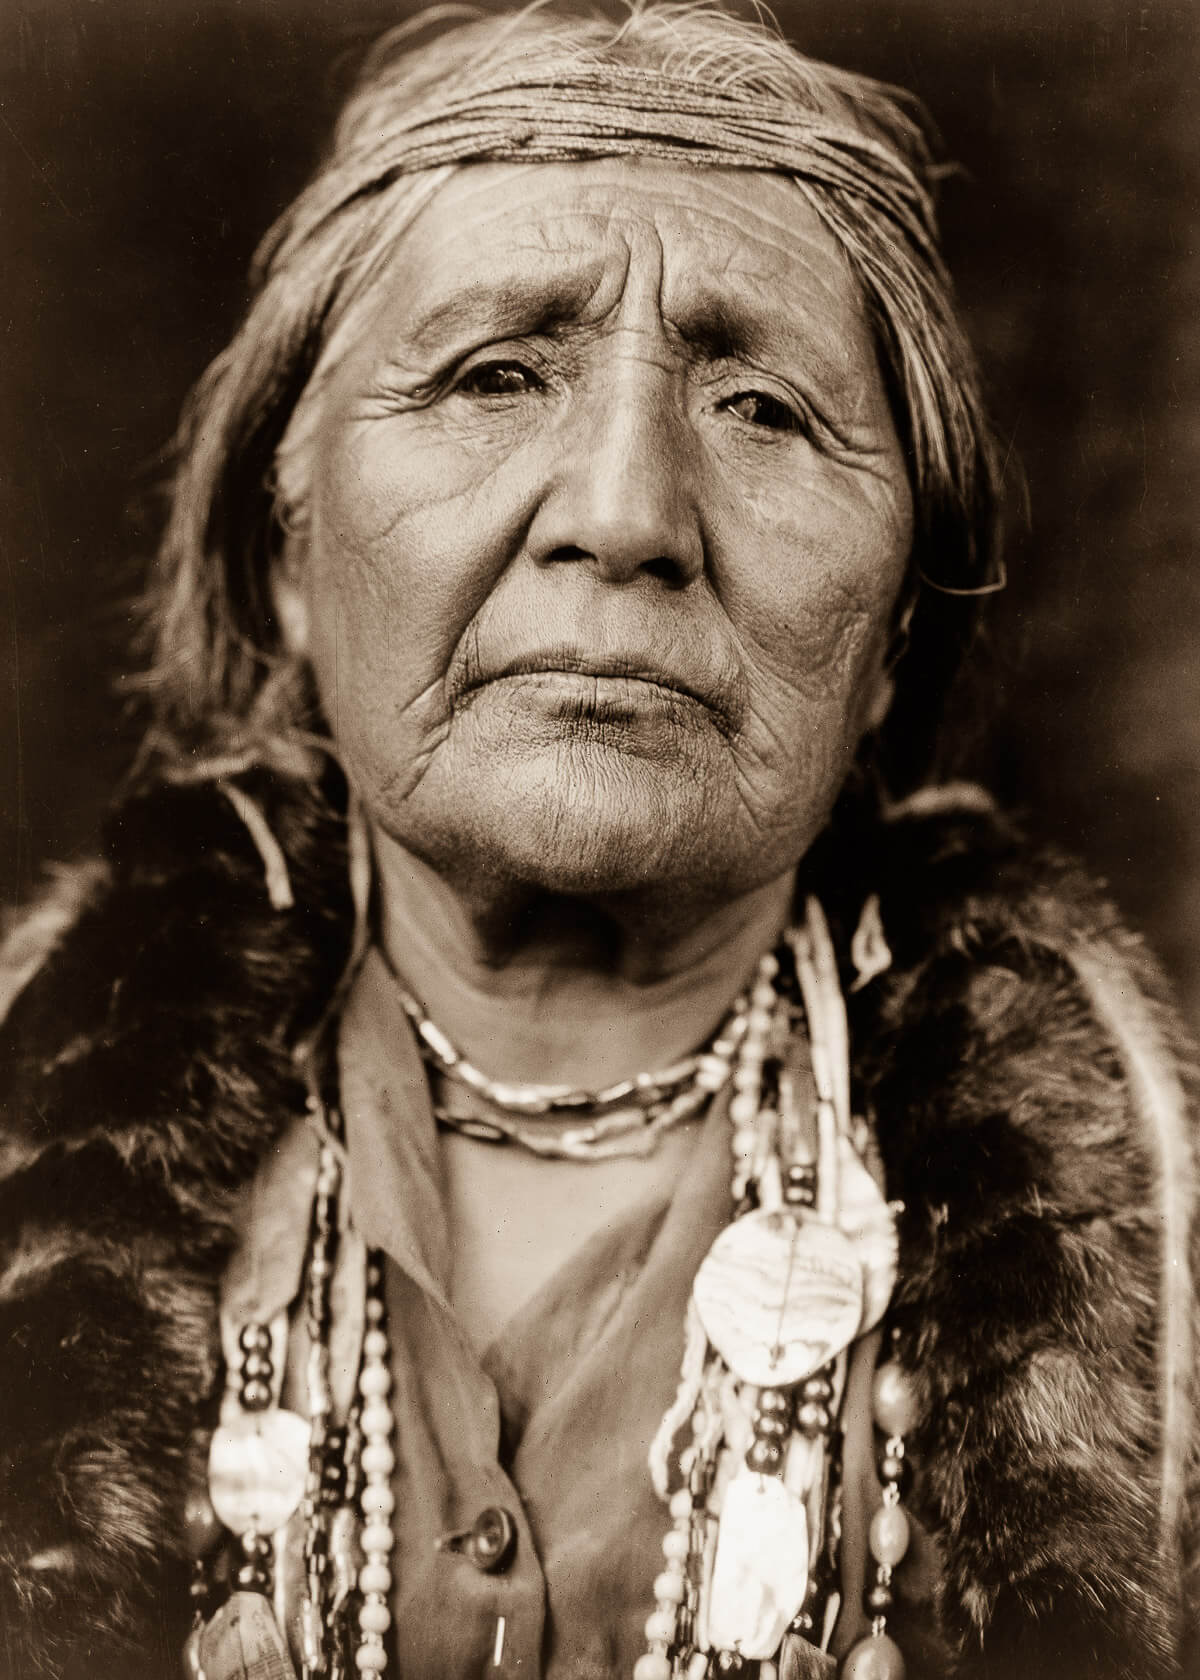 NativeAmerican-fotografia-oldskull-23